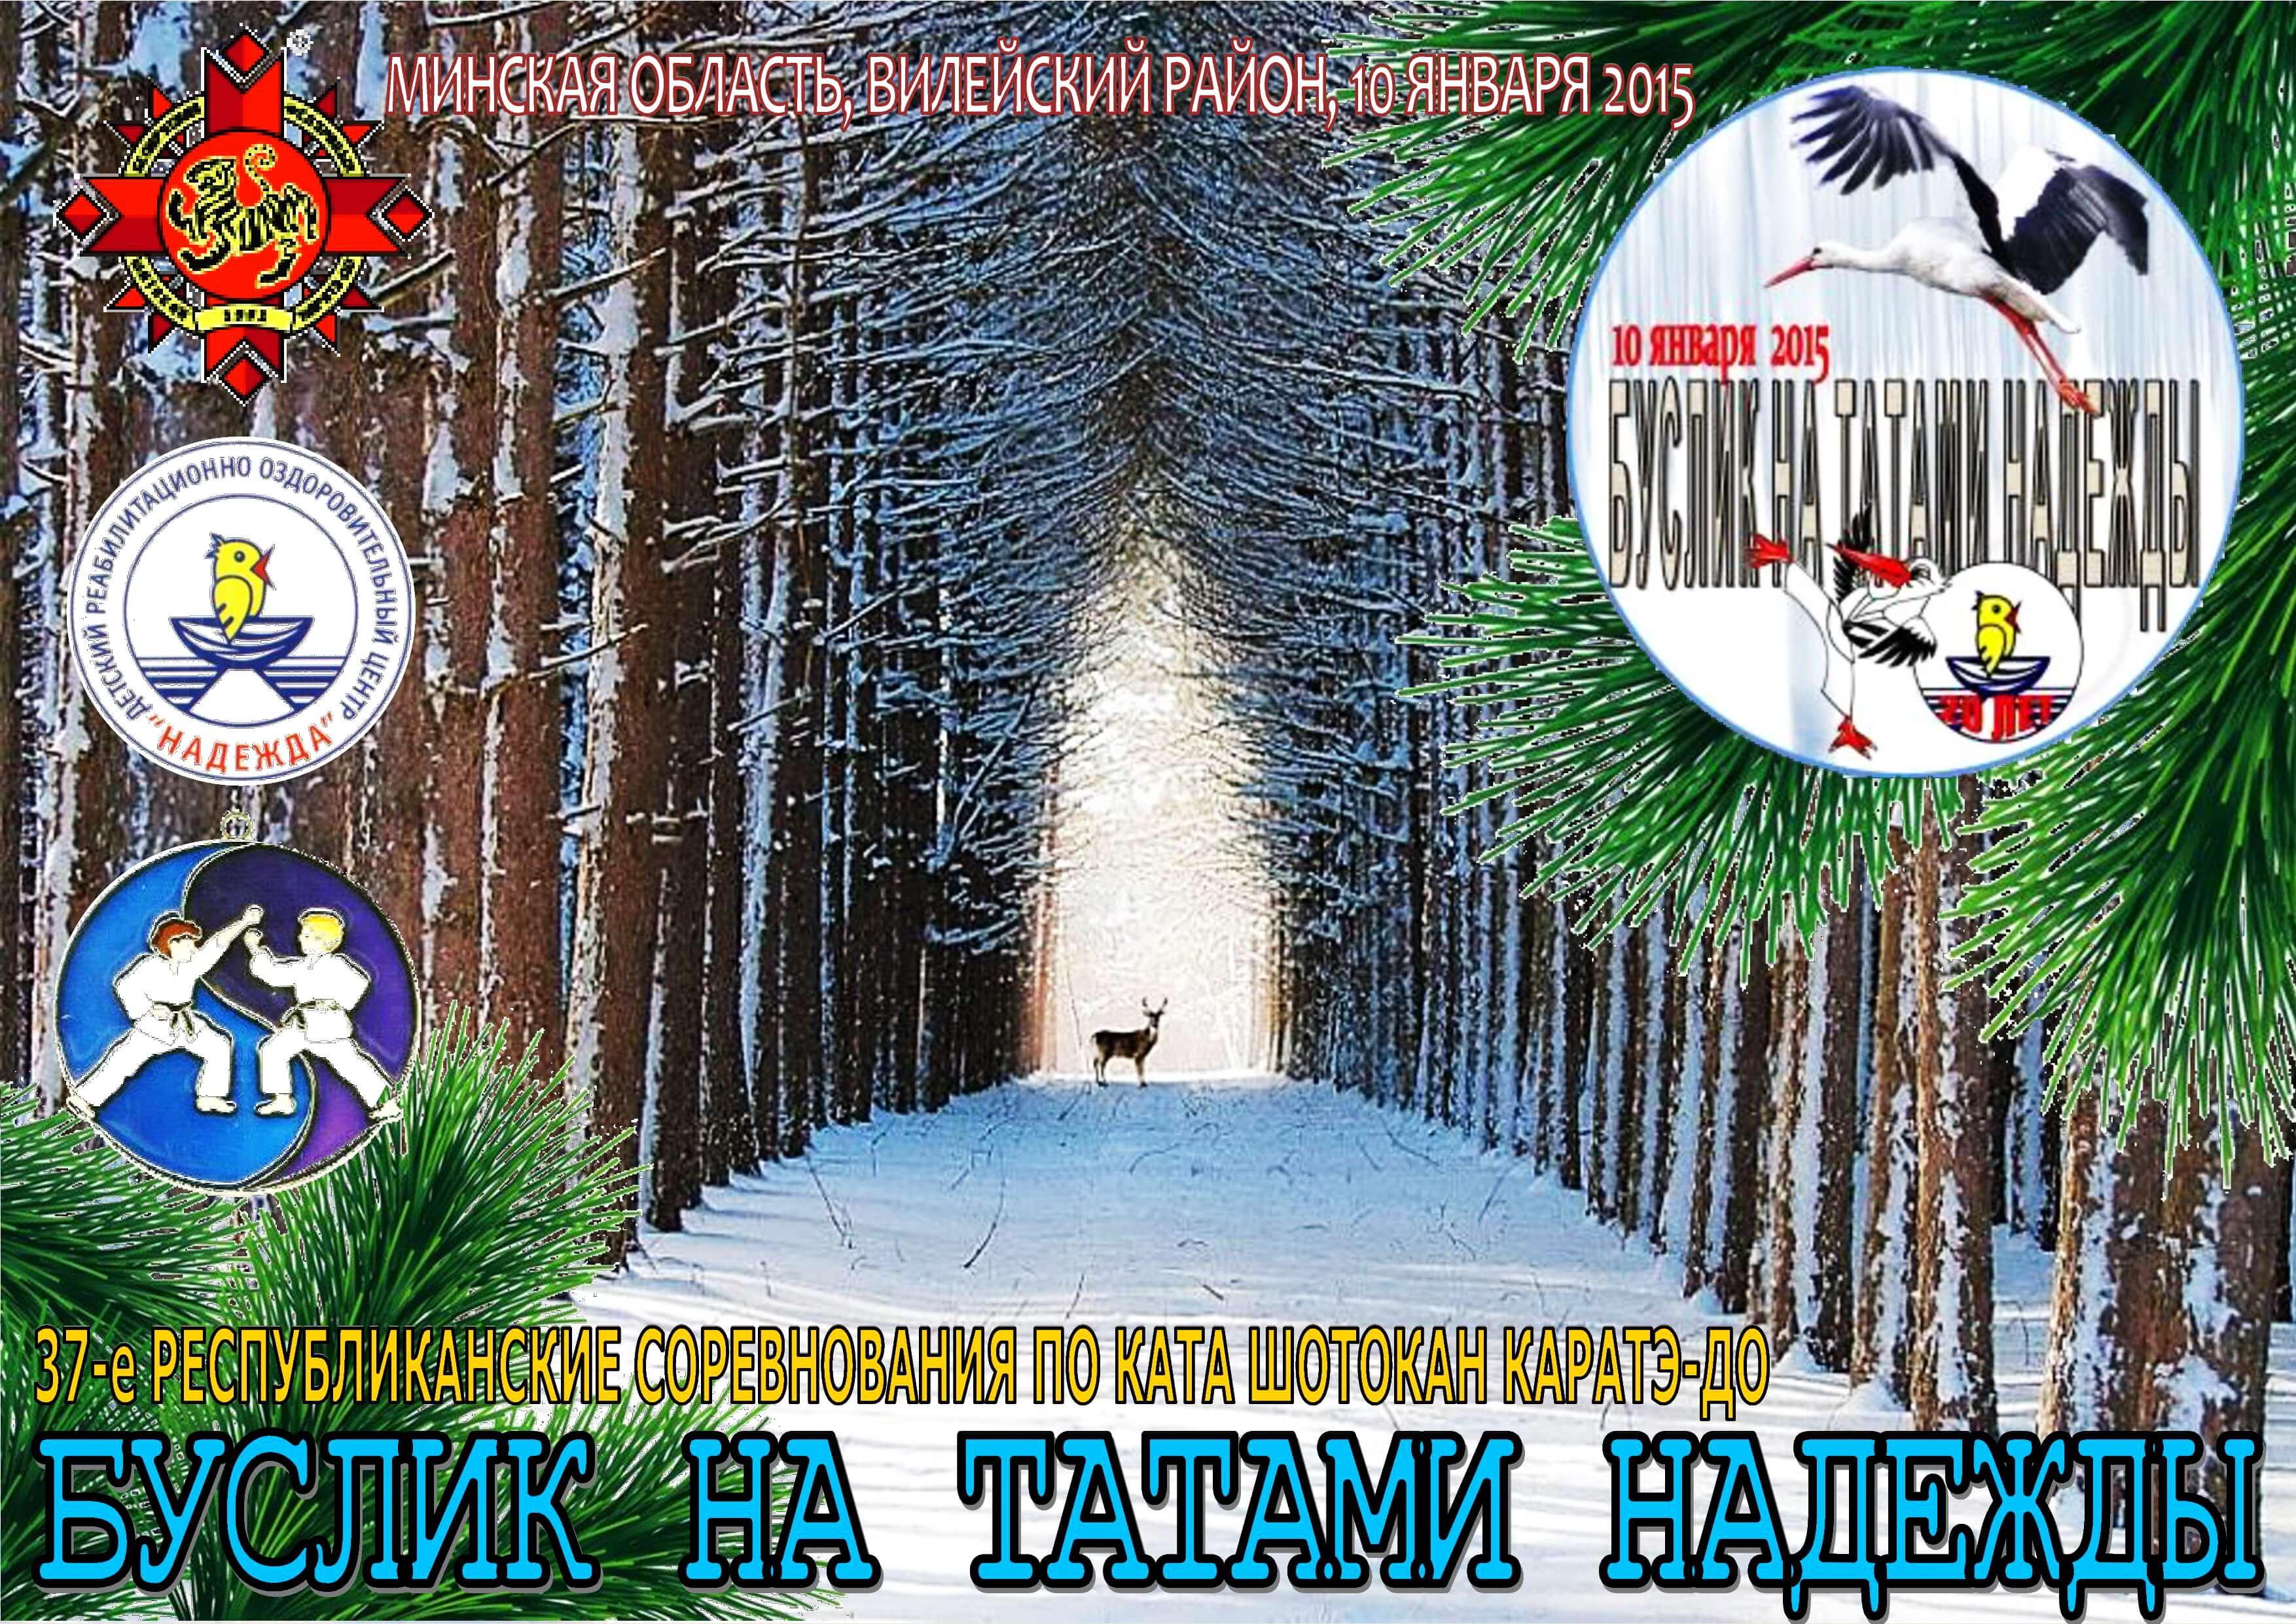 Буслик 01-2014 Постер